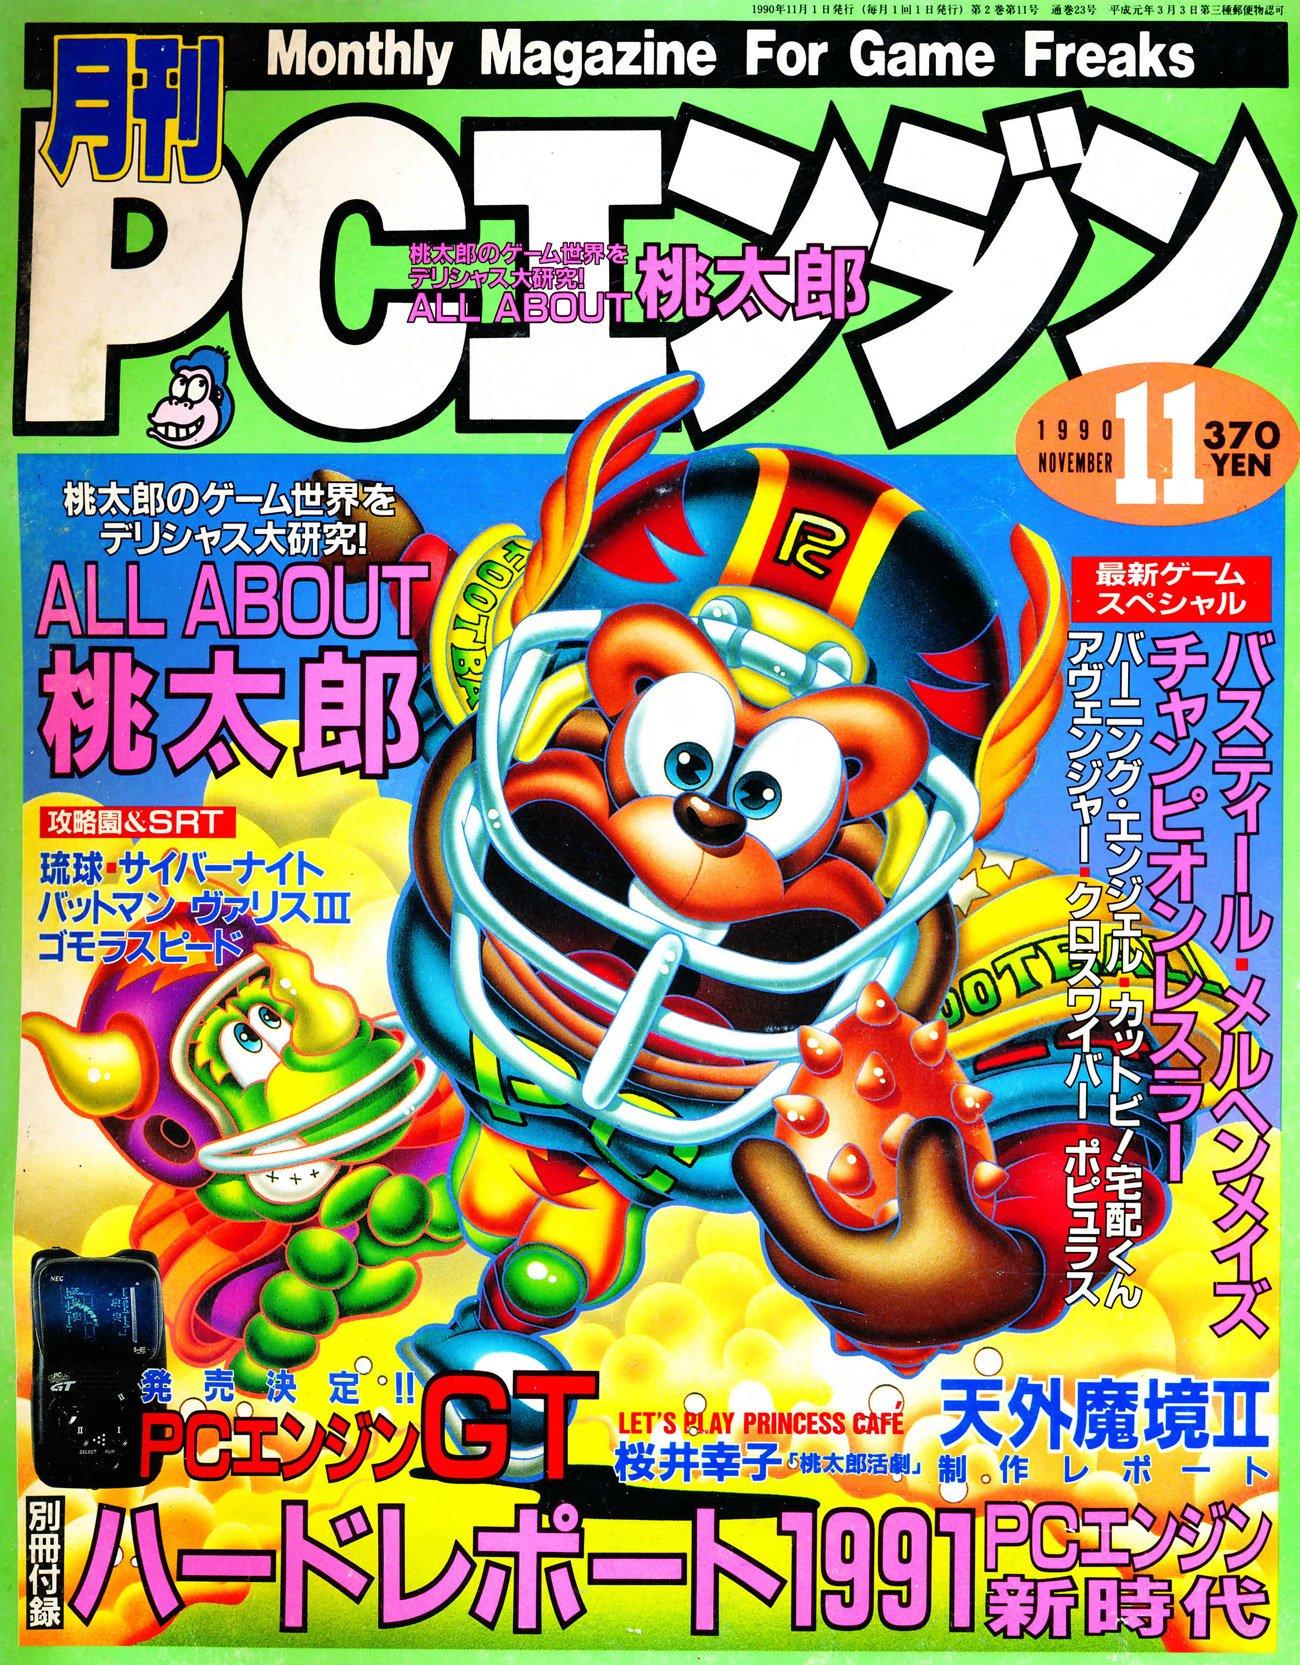 Gekkan PC Engine Issue 23 (November 1990)